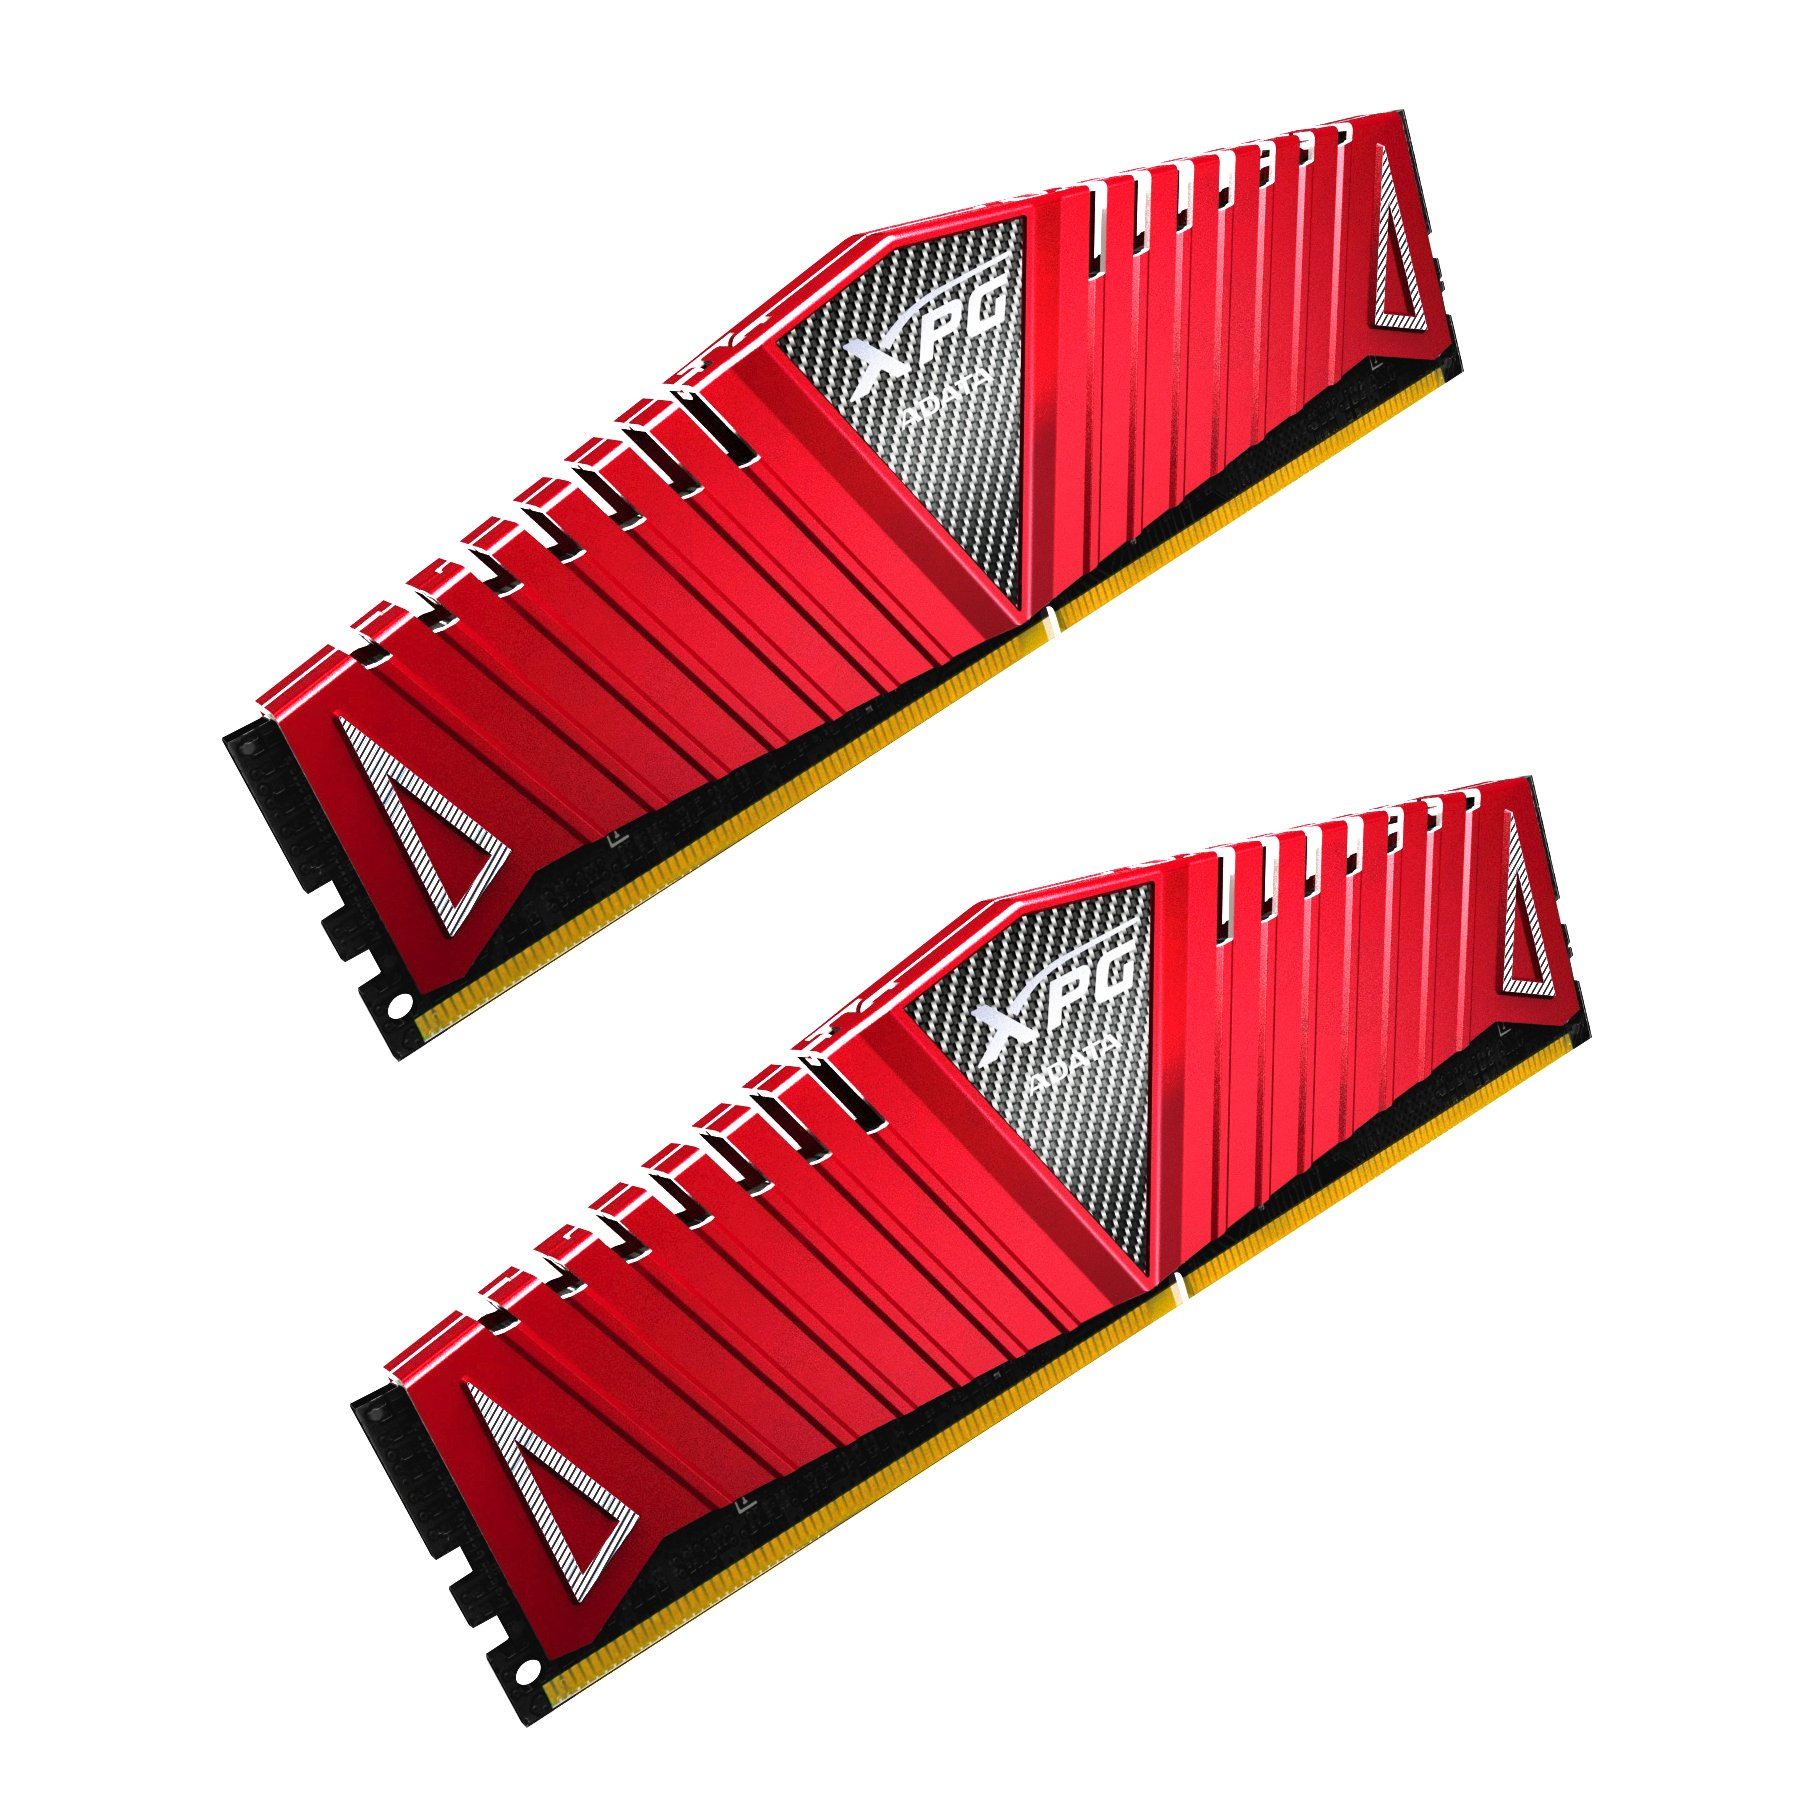 ADATA XPG Z1 DDR4 2800 MHz (PC4 22400) 16GB (2x8GB) Memory Modules, Red (AX4U280038G17-DRZ)